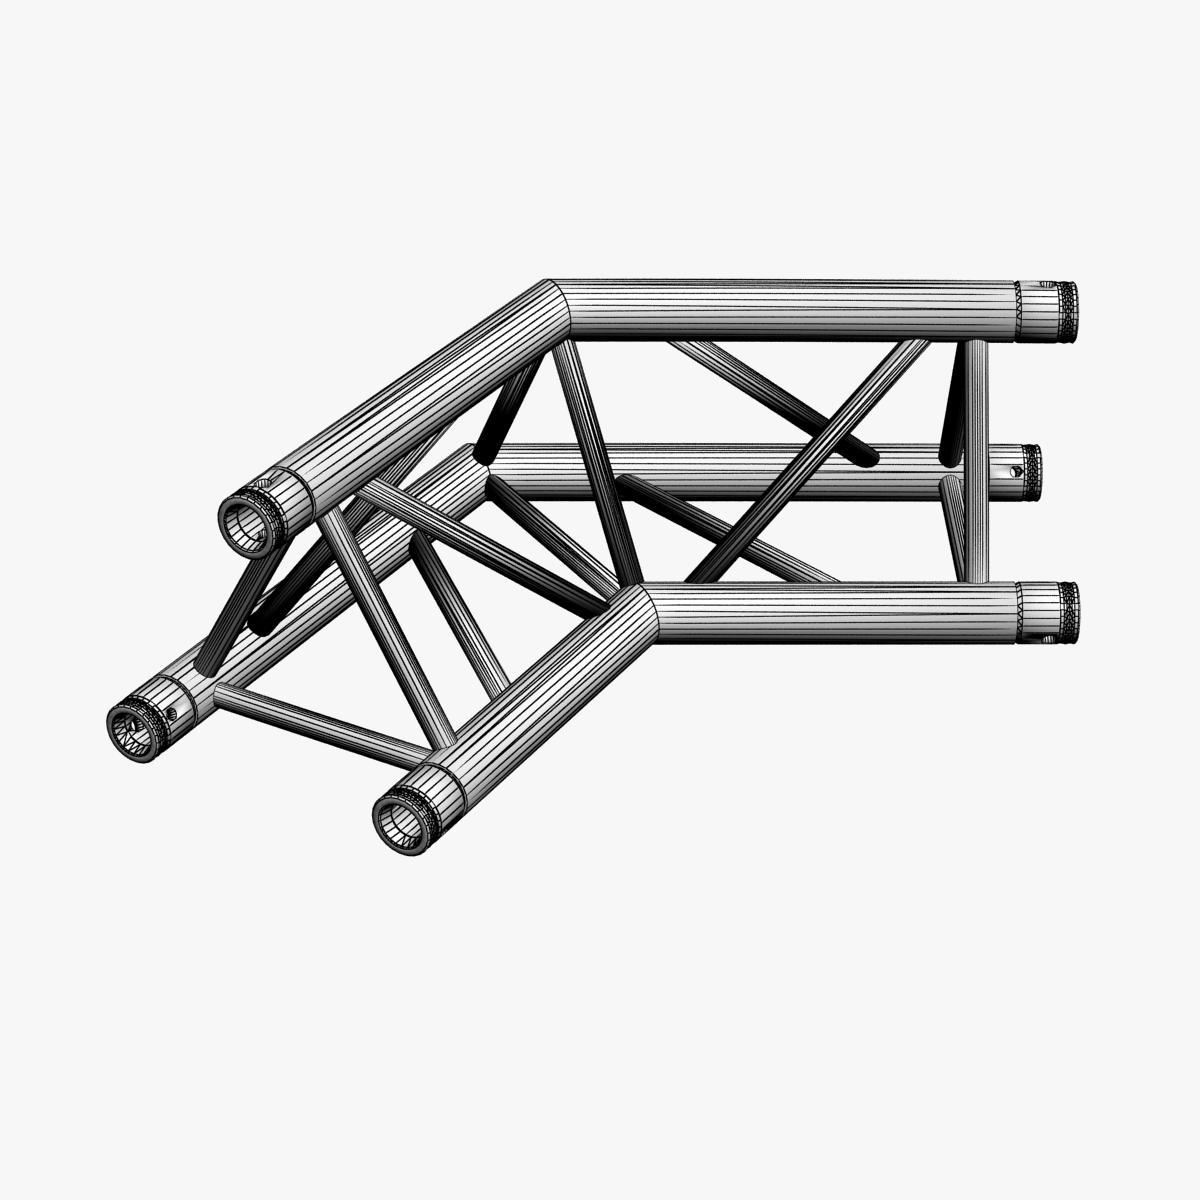 triangular trusses (collection 55 modular pieces) 3d model 3ds max dxf fbx c4d dae texture obj 216245